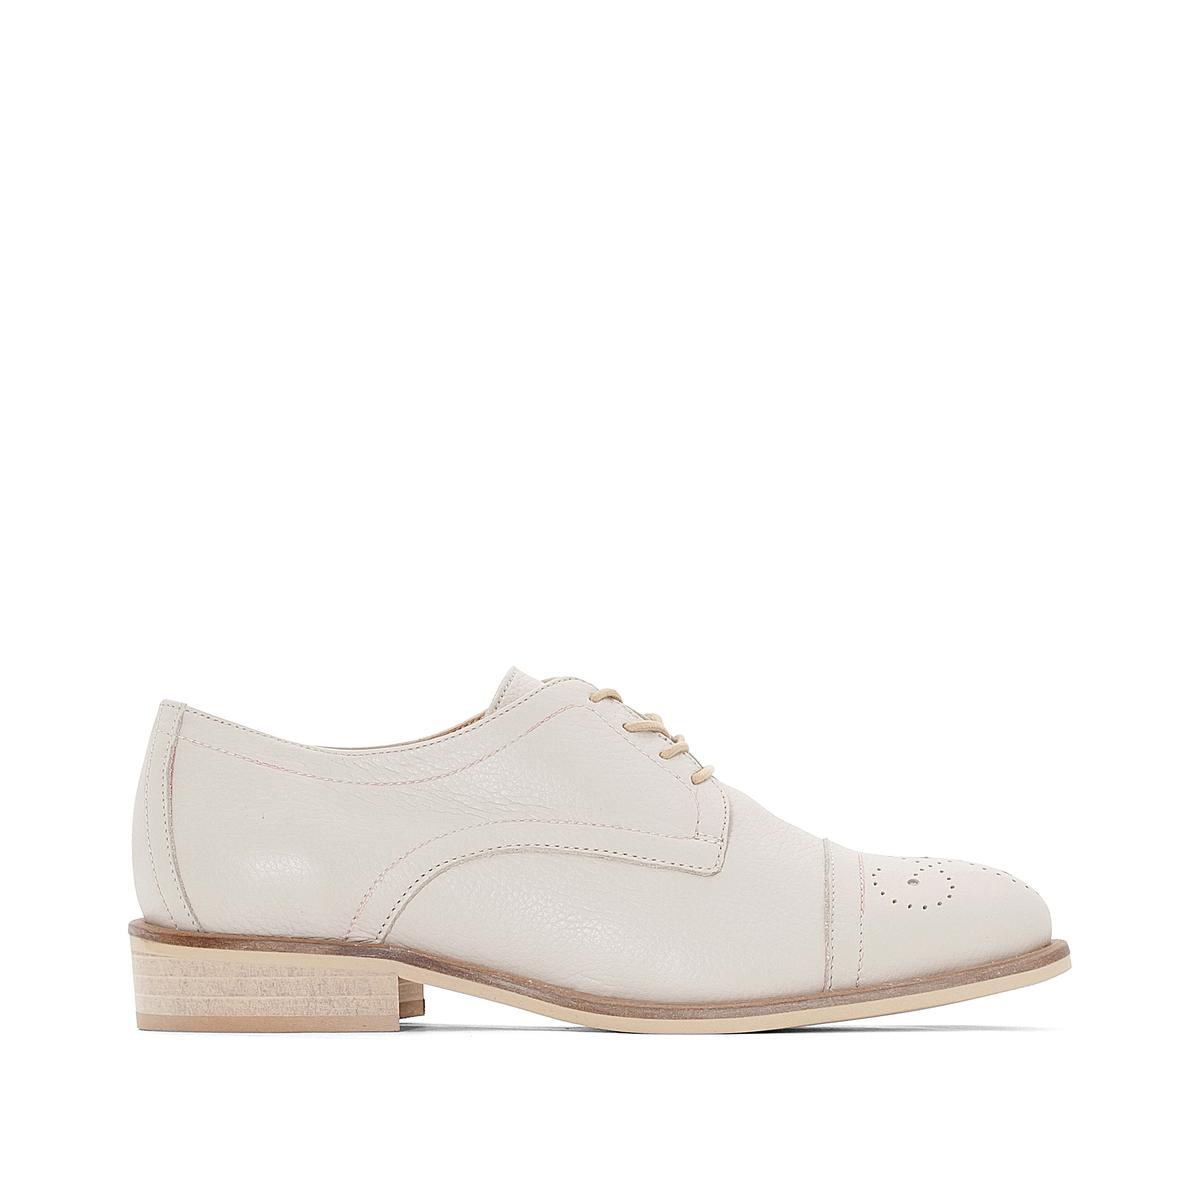 Ботинки-дерби кожаные Marette